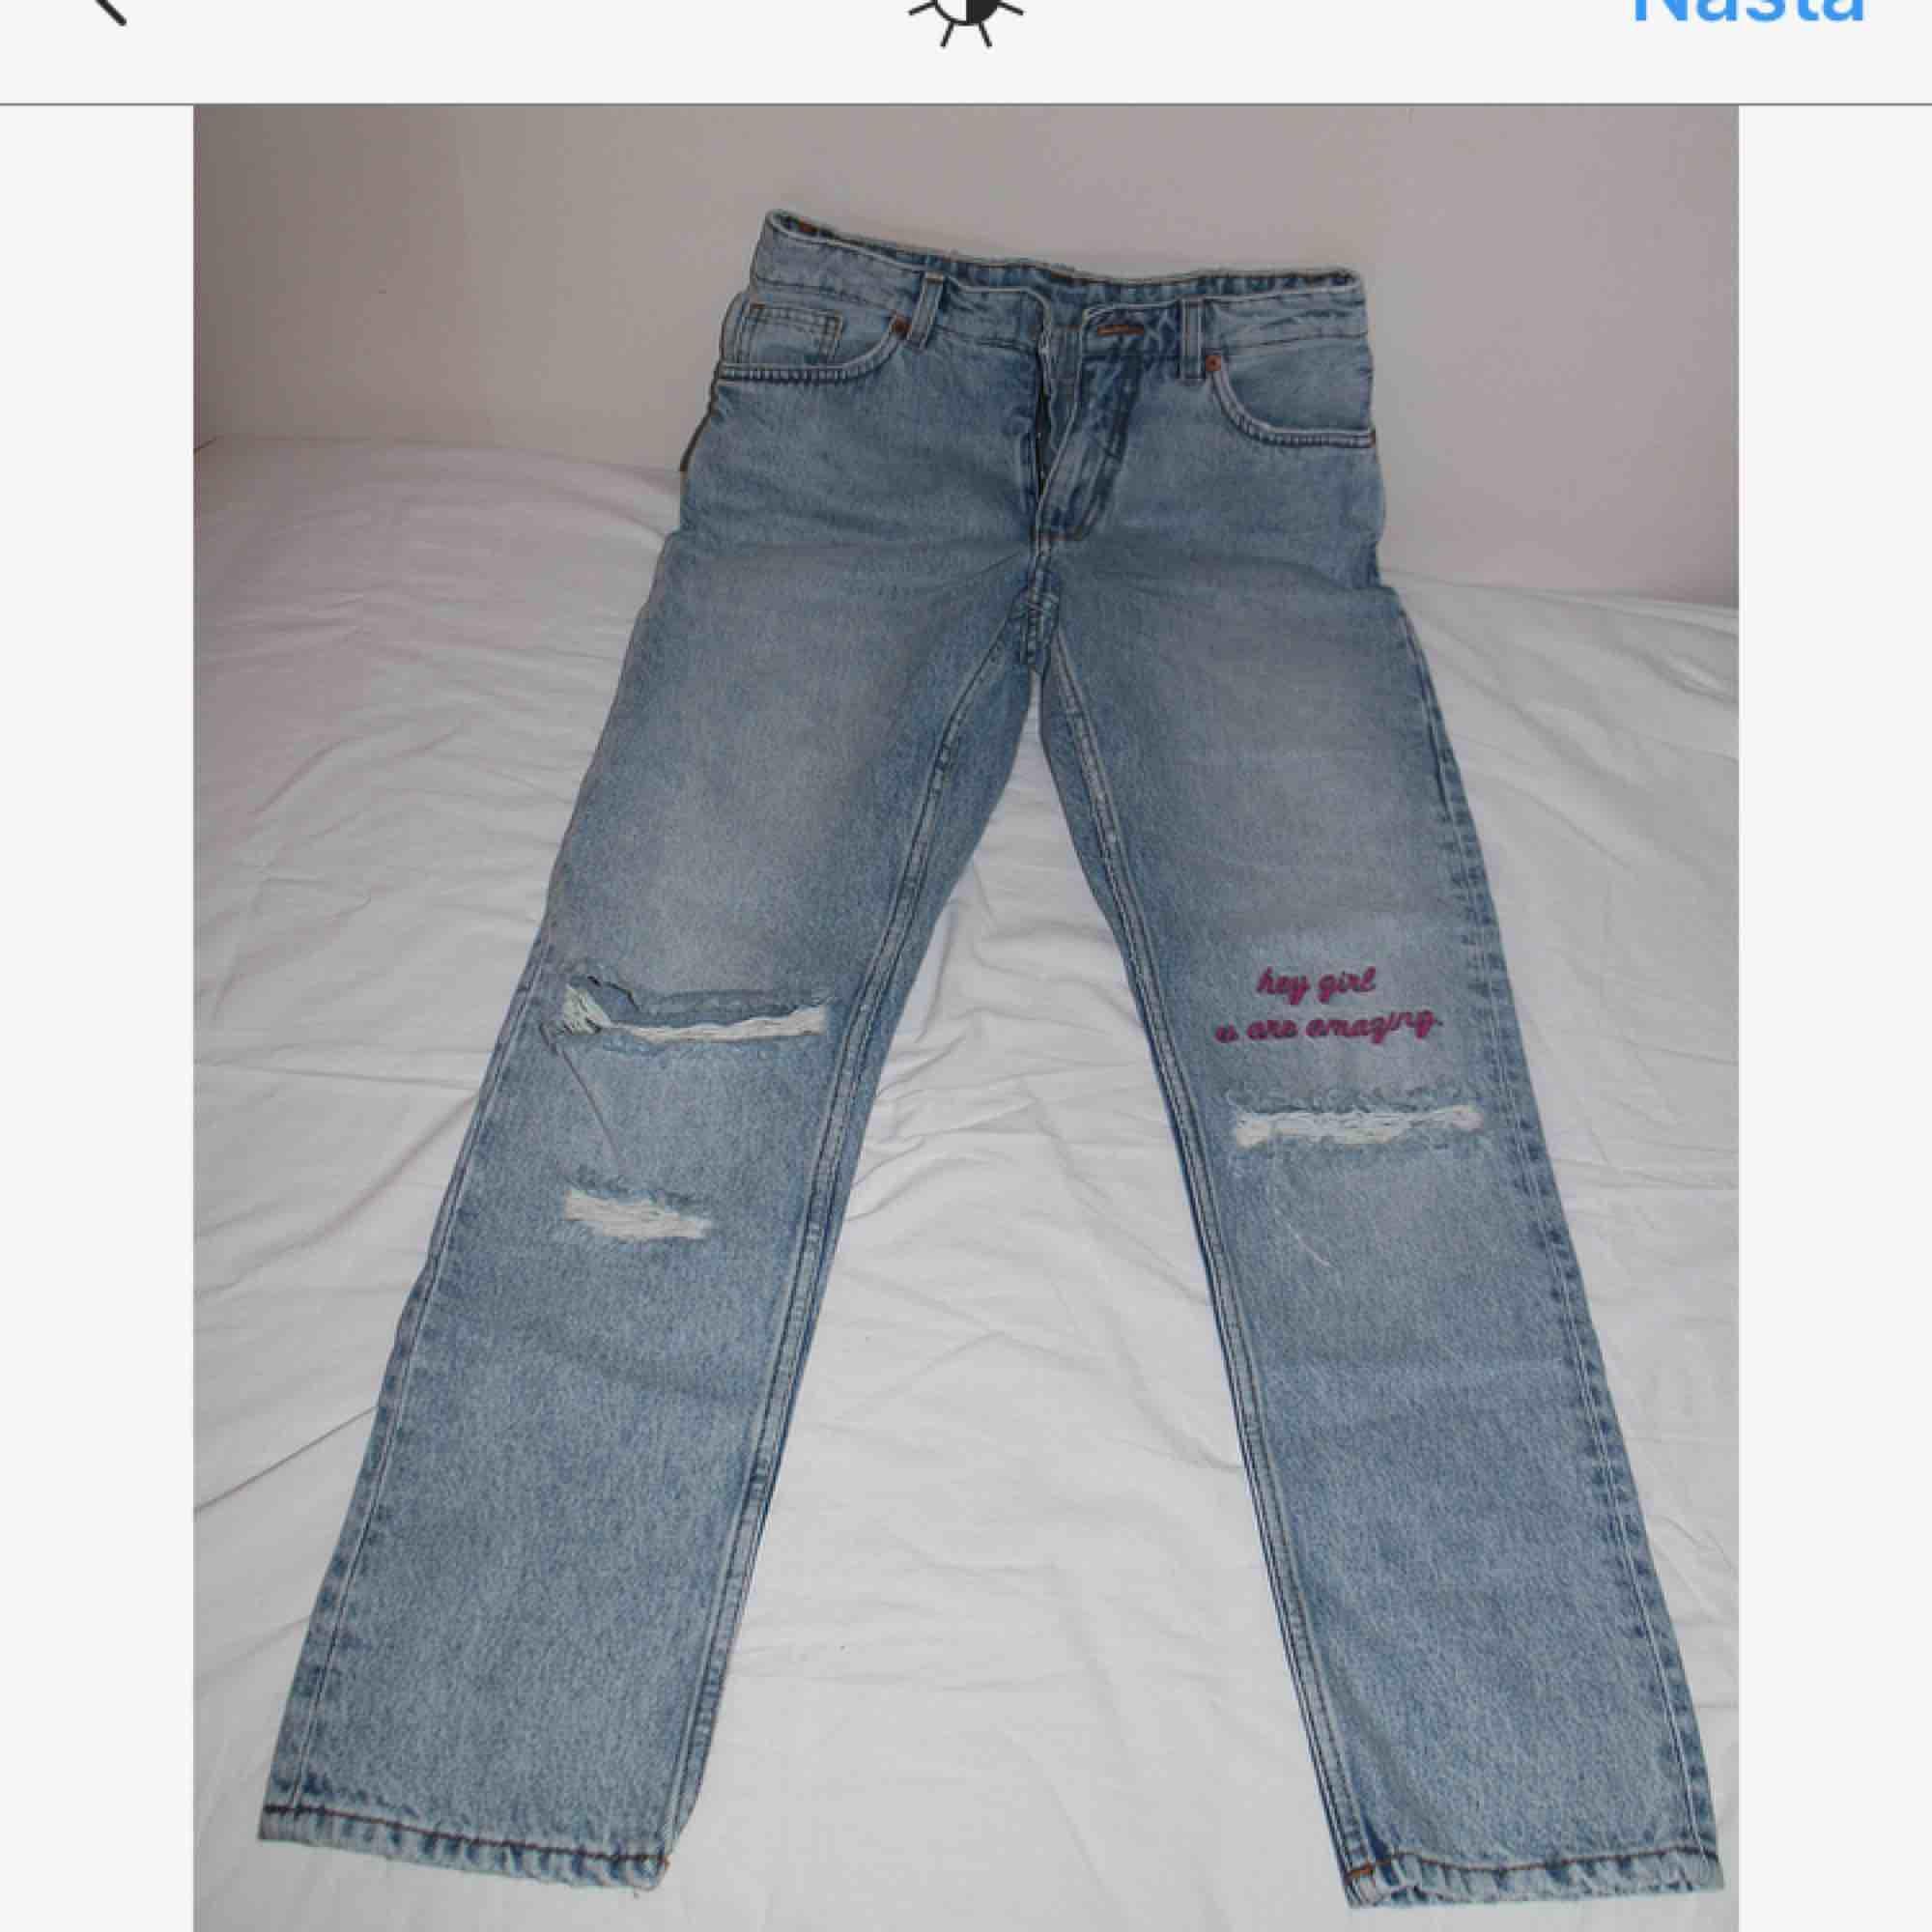 Supersnygga jeans från MONKI! - Monki Jeans   Byxor - Second Hand 79570aa289e87